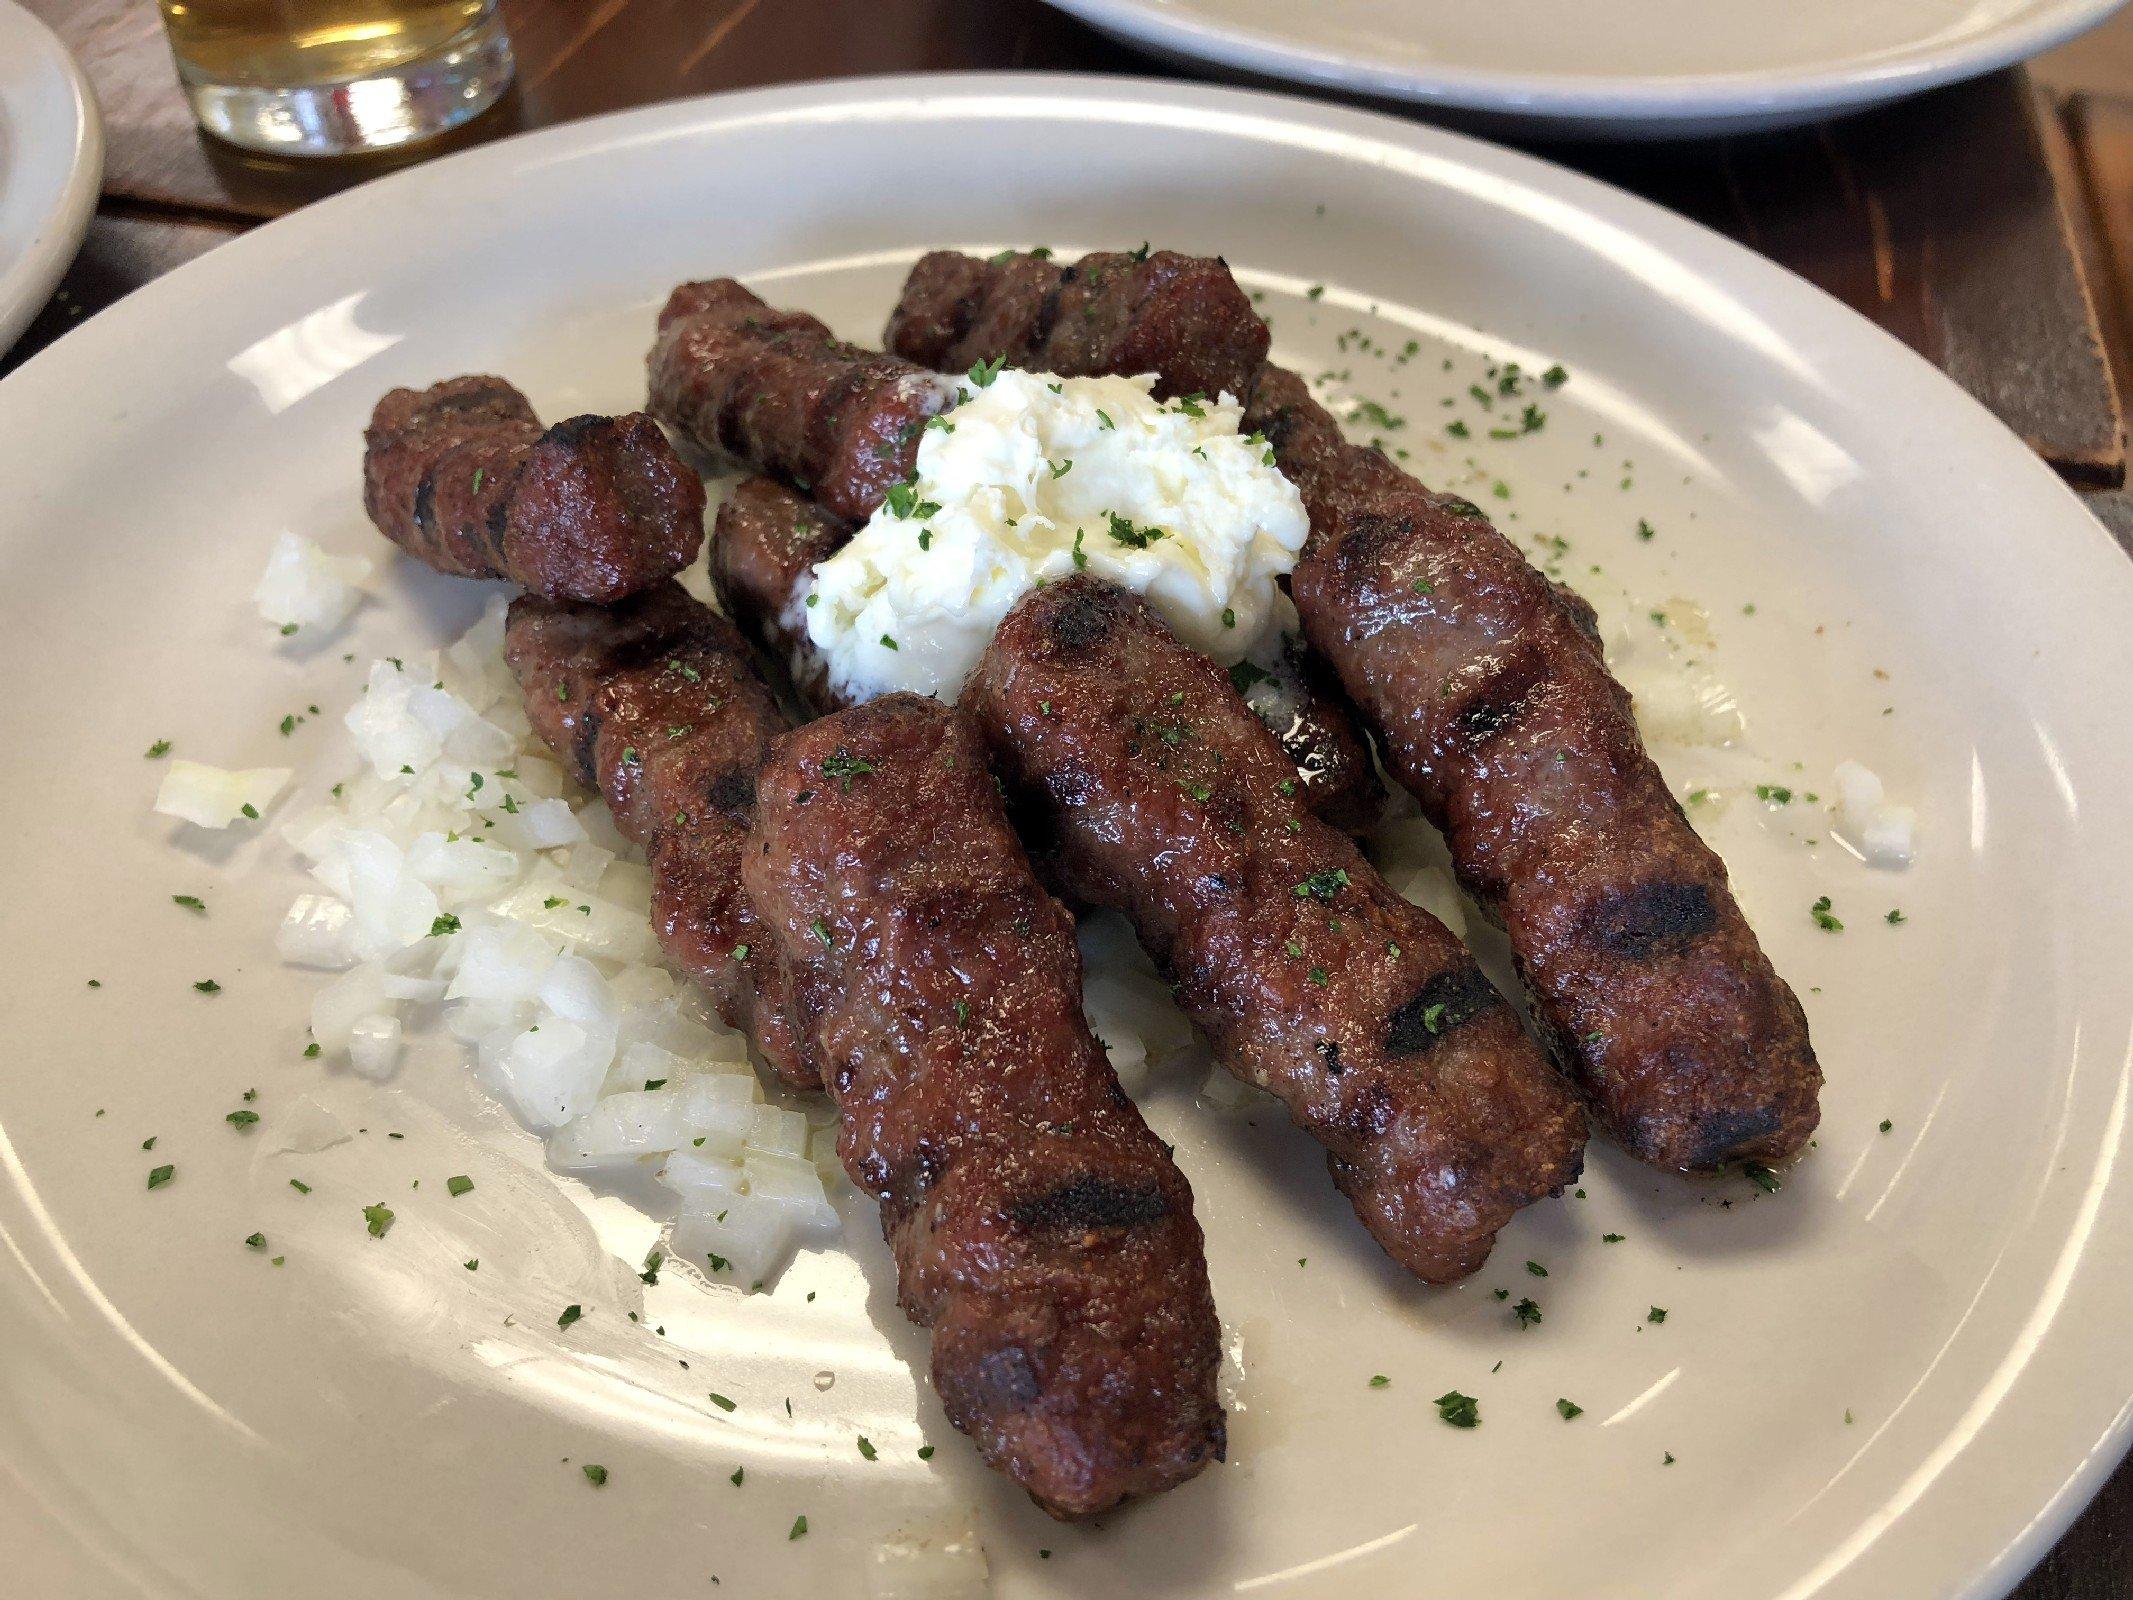 Balkan Taste in Mt. Prospect, IL by Jets Like Taxis